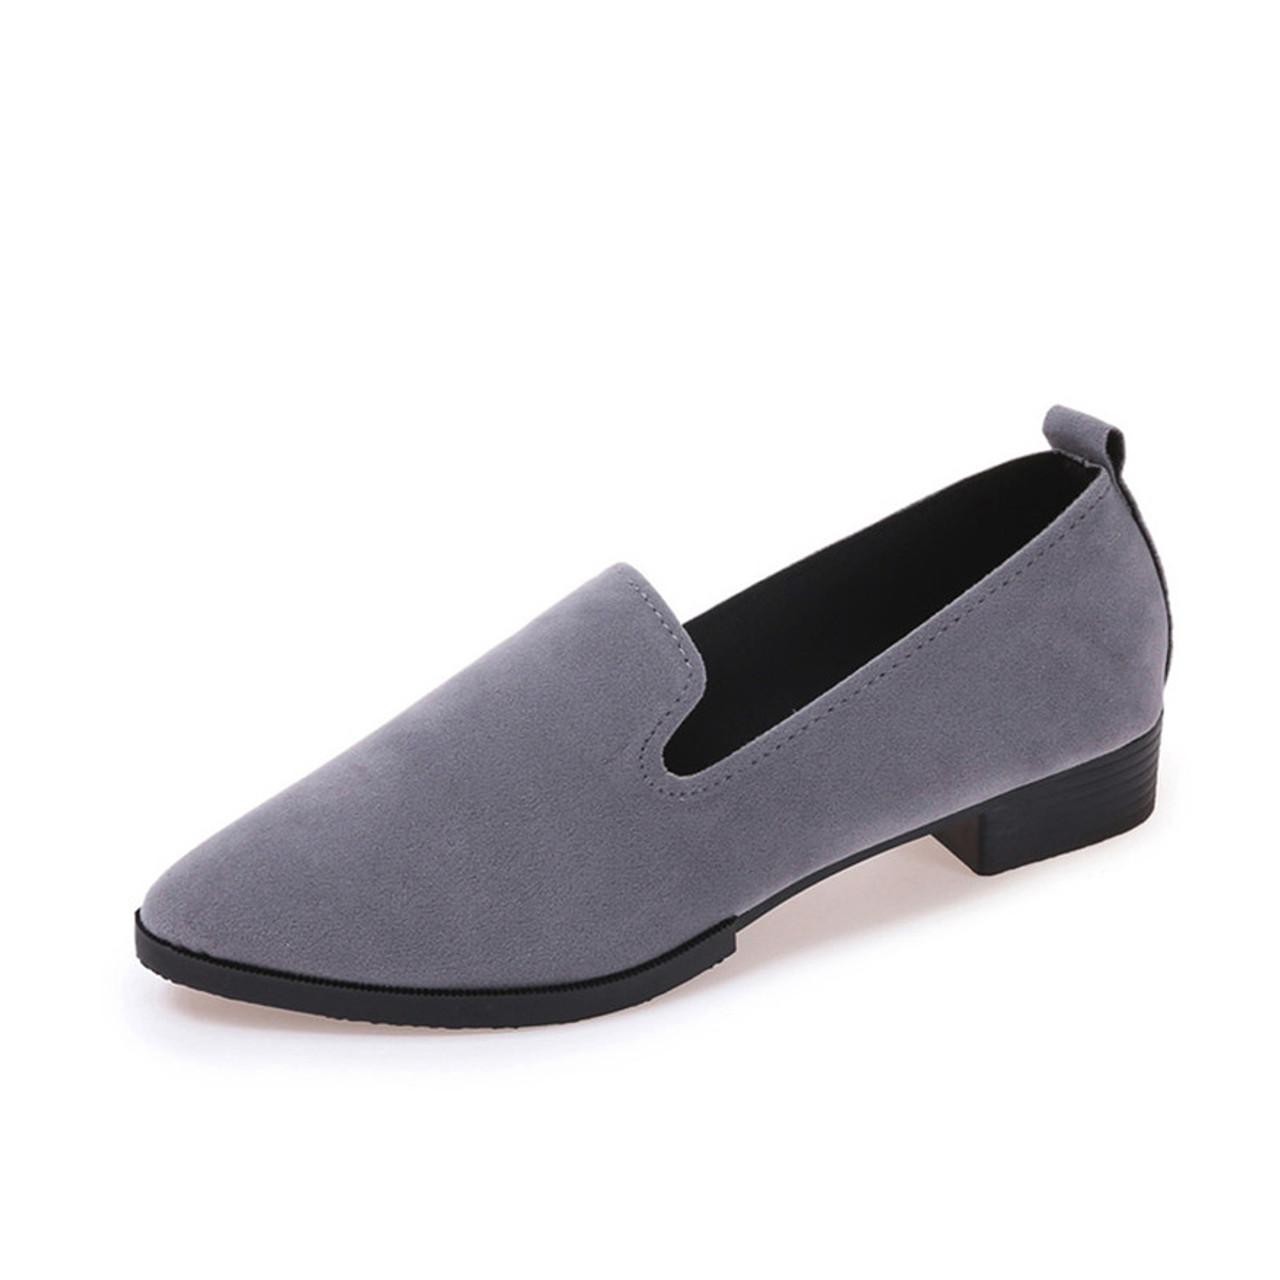 Image result for TALON Footwear